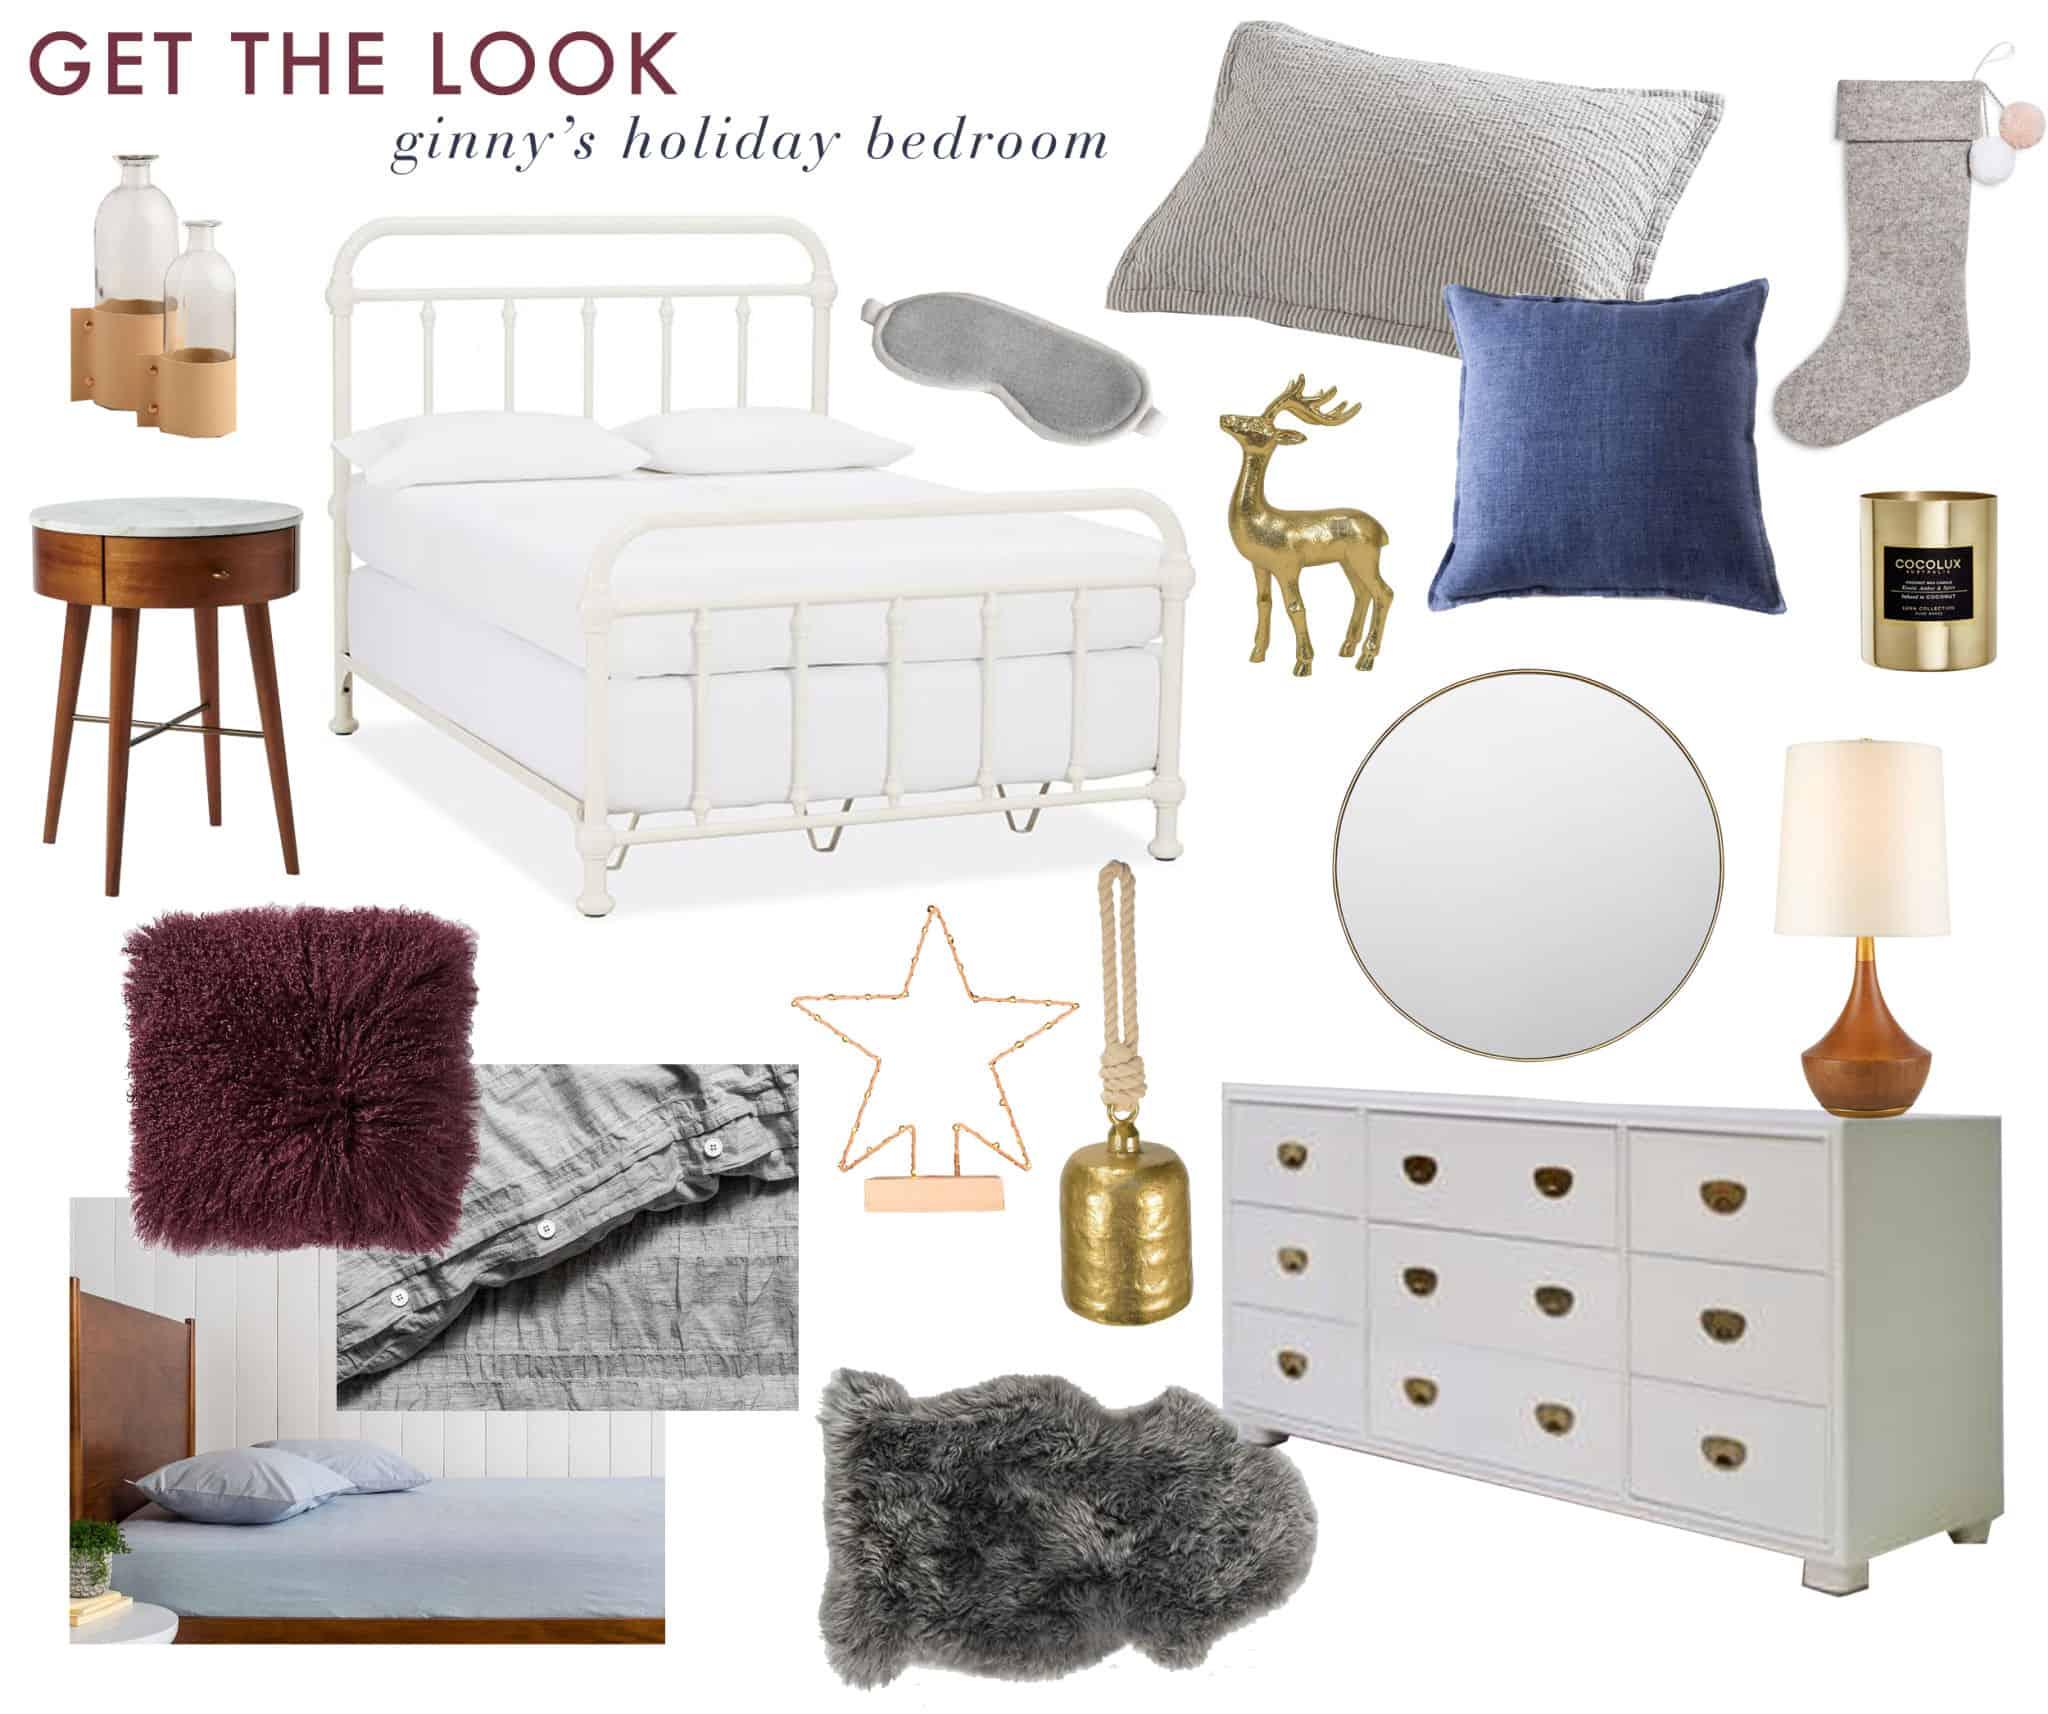 emily-henderson_holiday_bedroom_ginny-macdonald_get-the-look